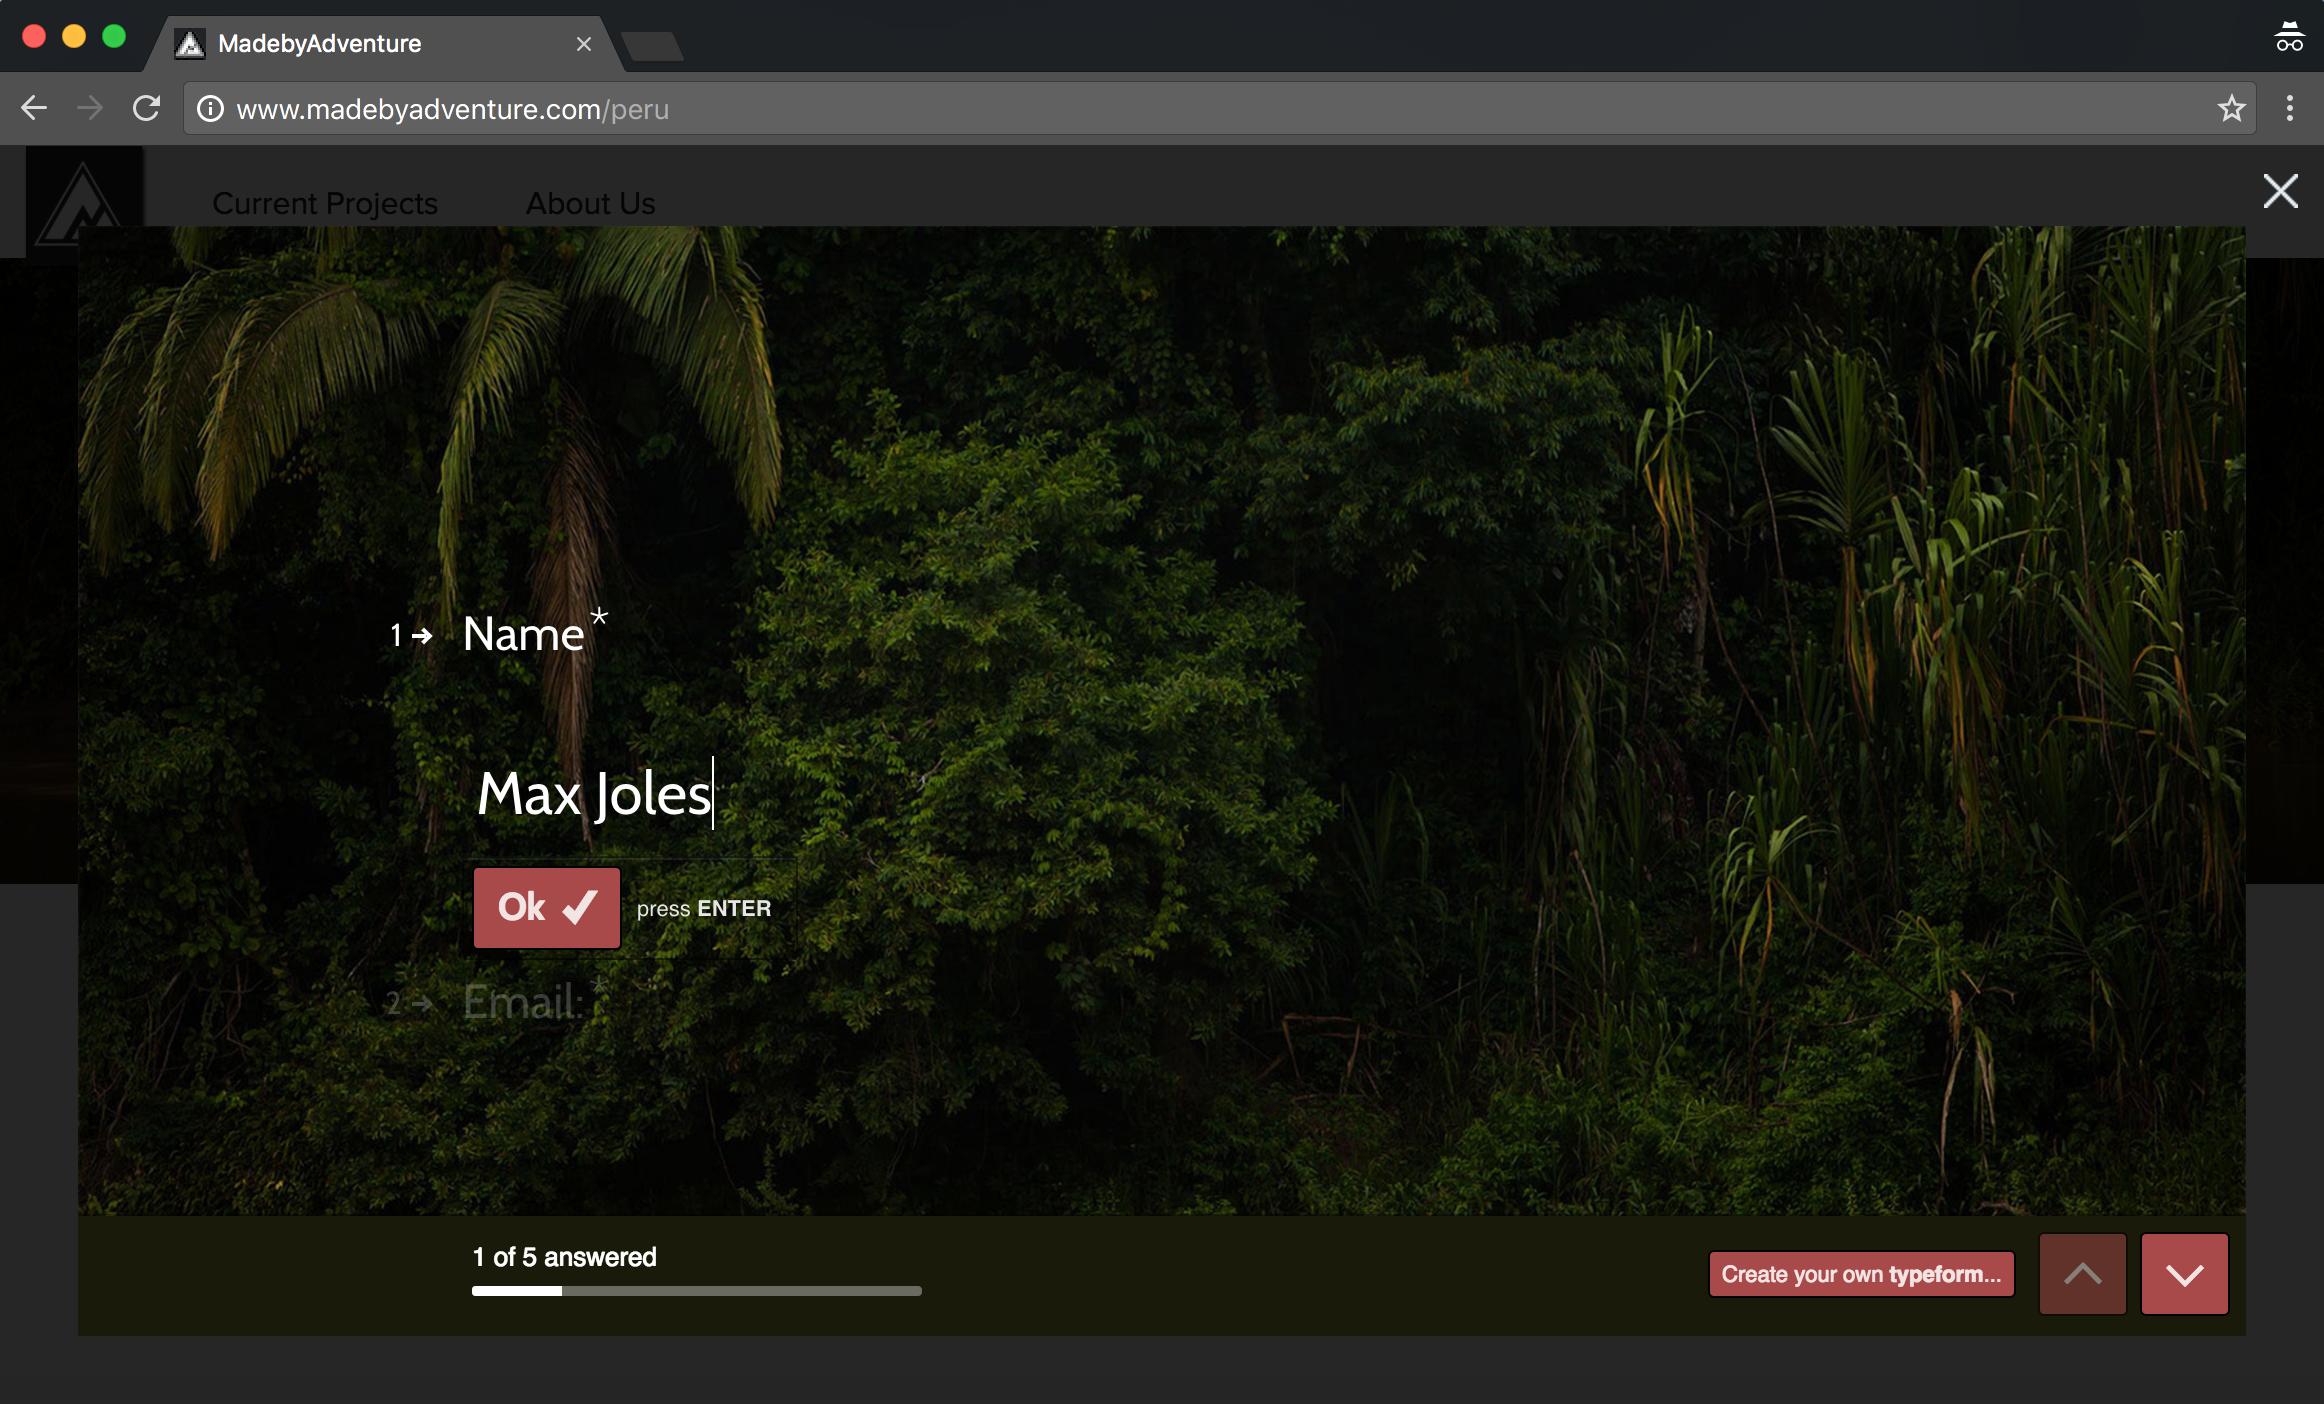 Screenshot fo typeform application for trip to Peru